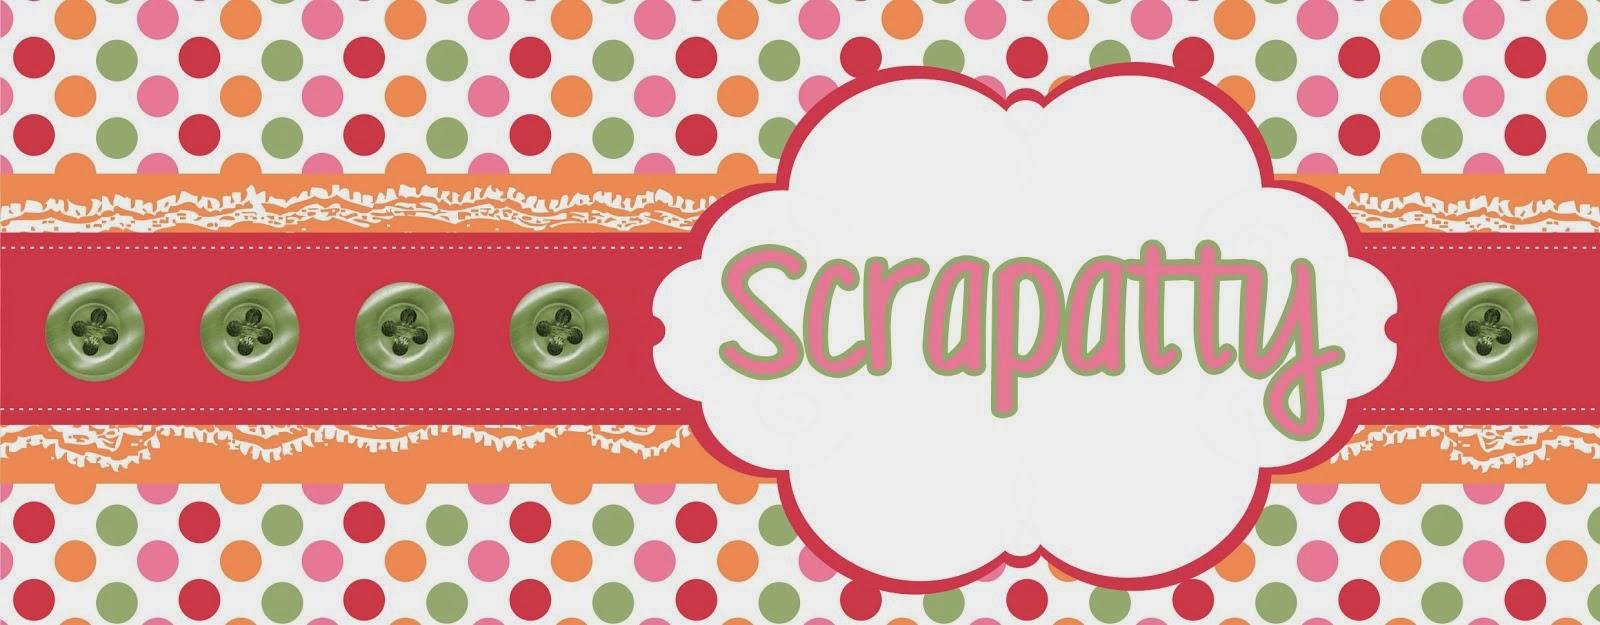 Scrapatty